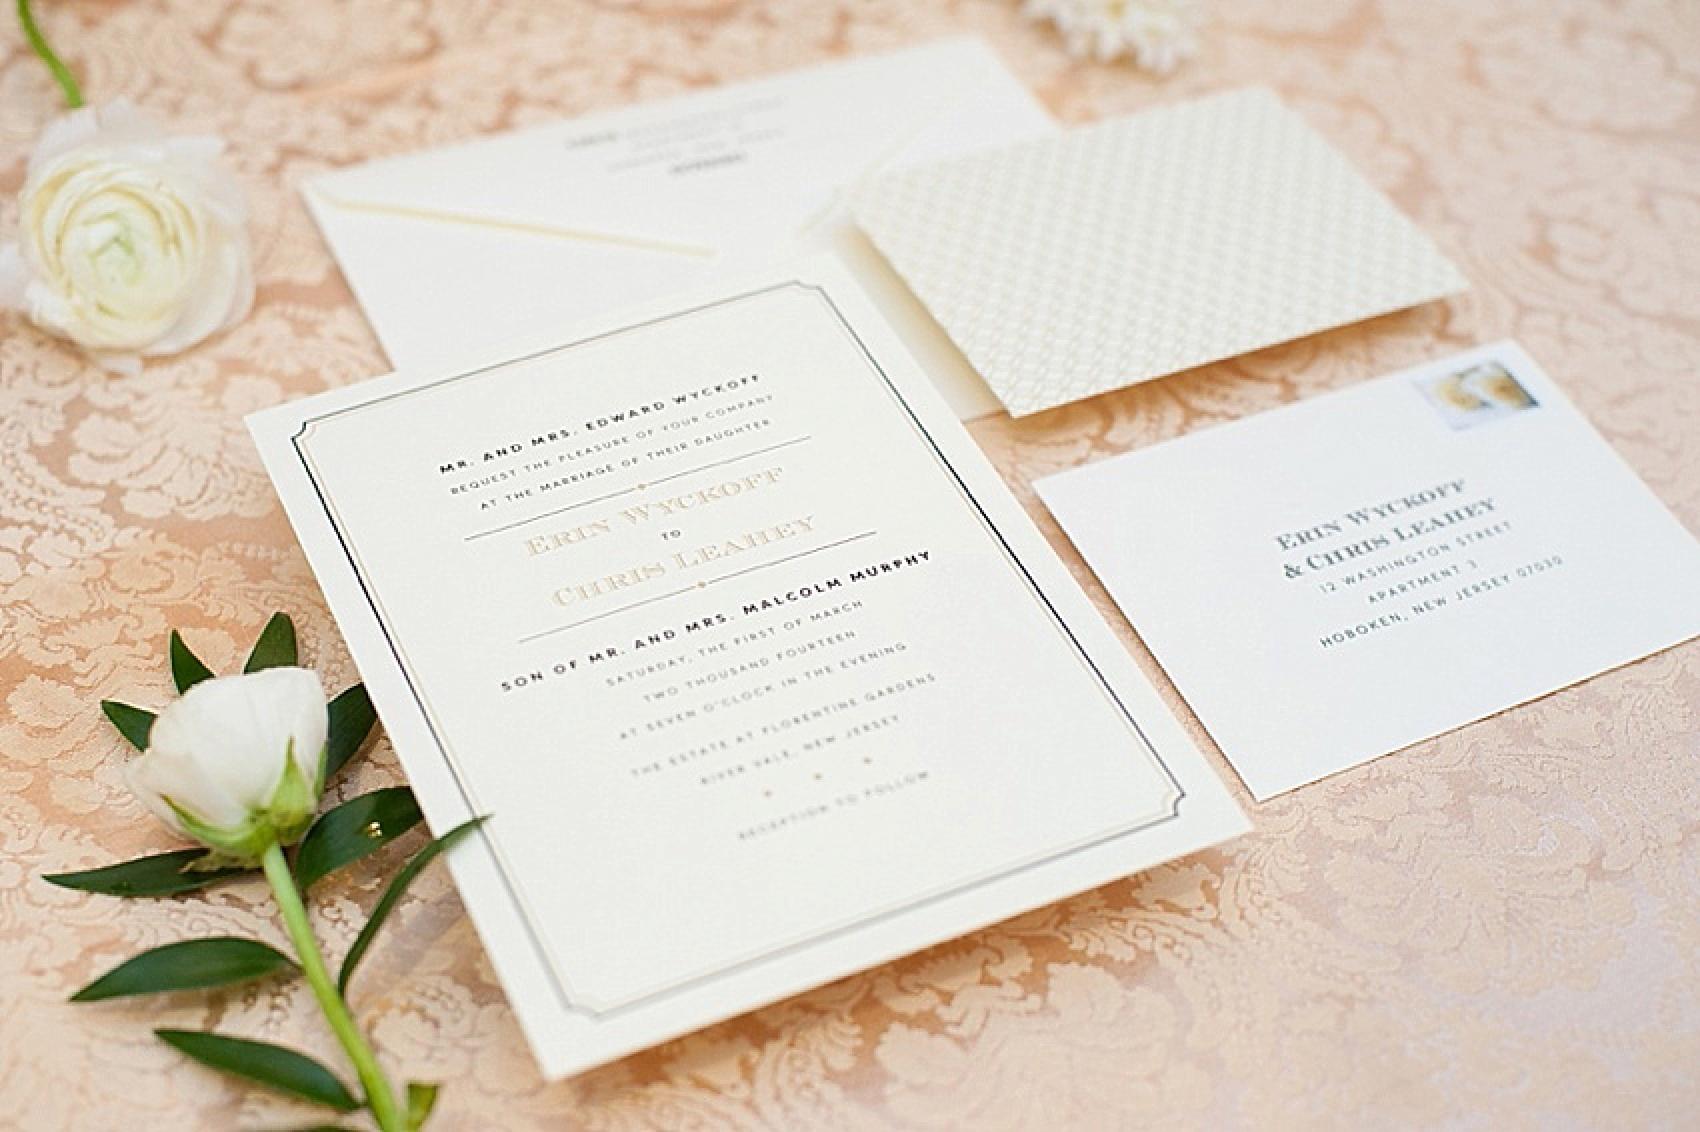 wedding invitations photos stationery paper suites gatsby wedding invitations Paper suites Wedding invitations and paper suites by Raleigh wedding photographer Mikkel Paige